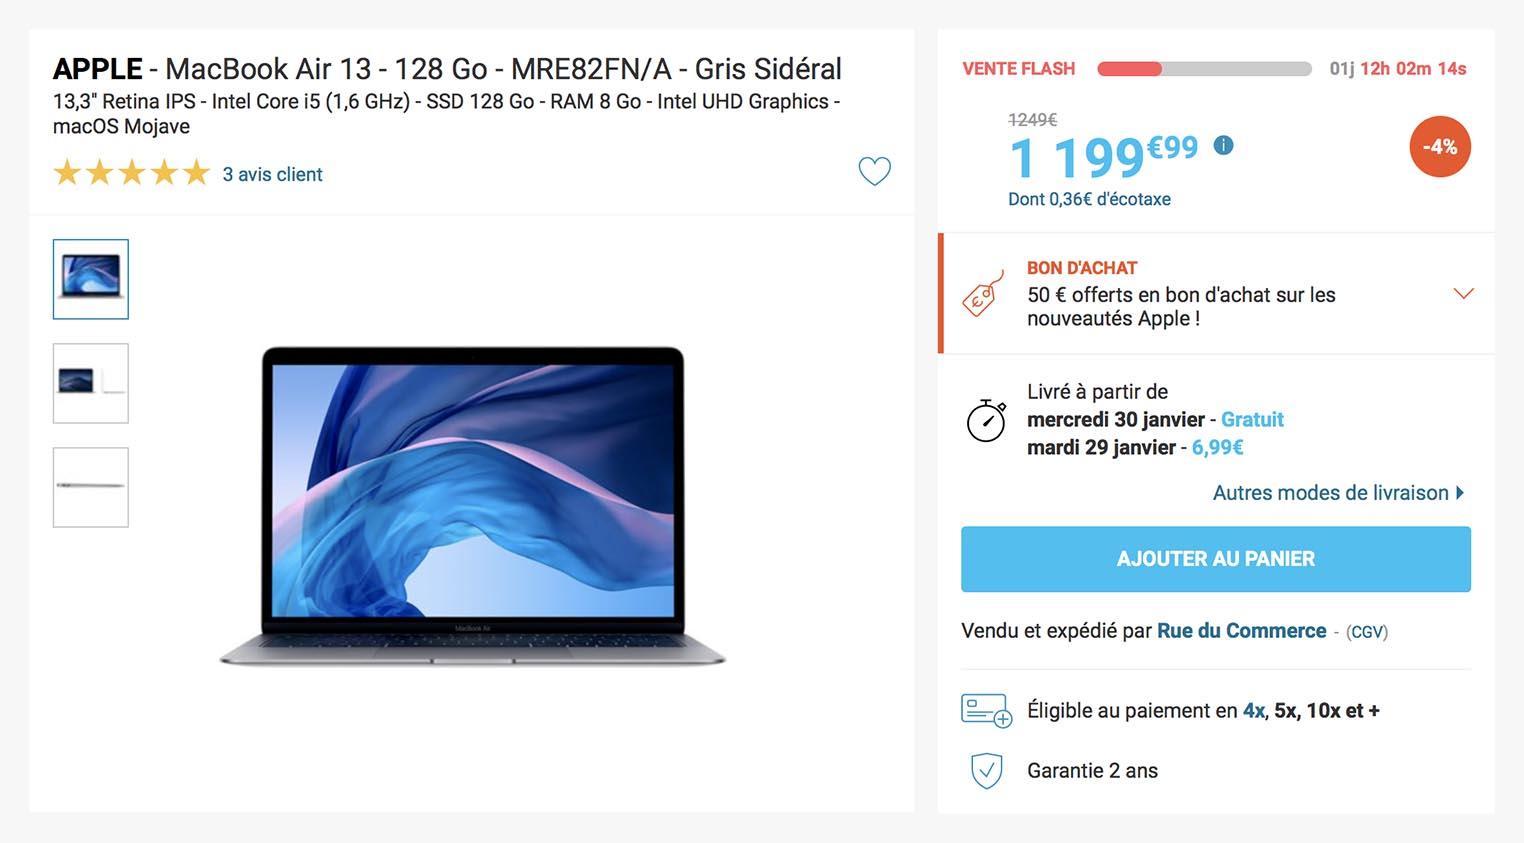 MacBook Air 2018 Rue du Commerce